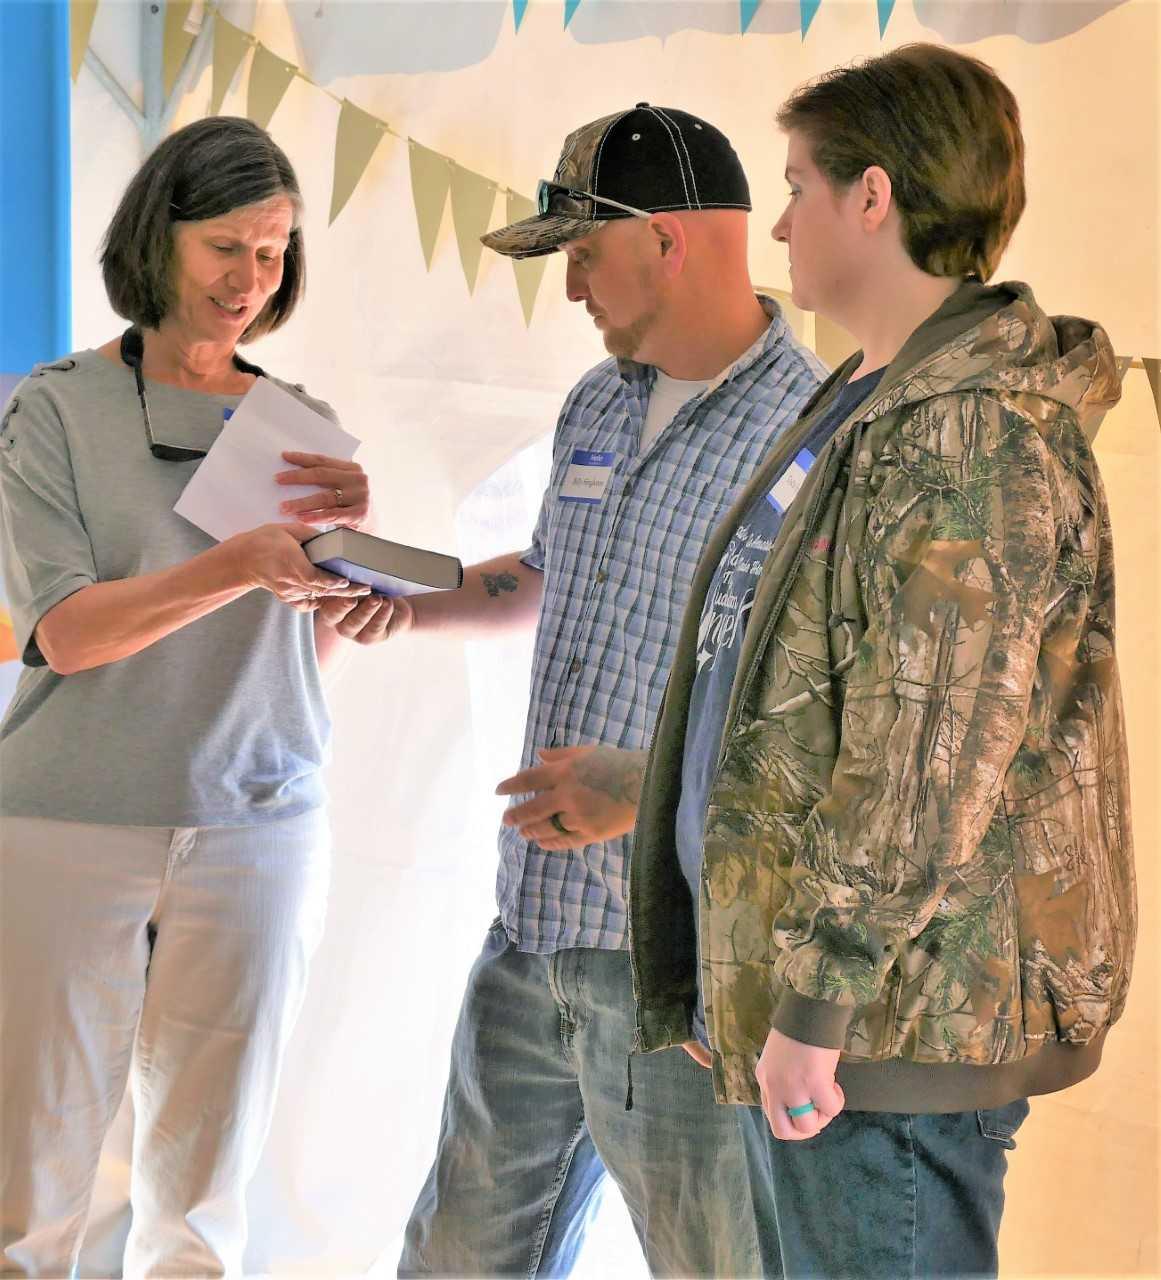 Beth Huggins, a Habitat for Humanity volunteer, presents a Bible to Billy and Tasha Singleton.